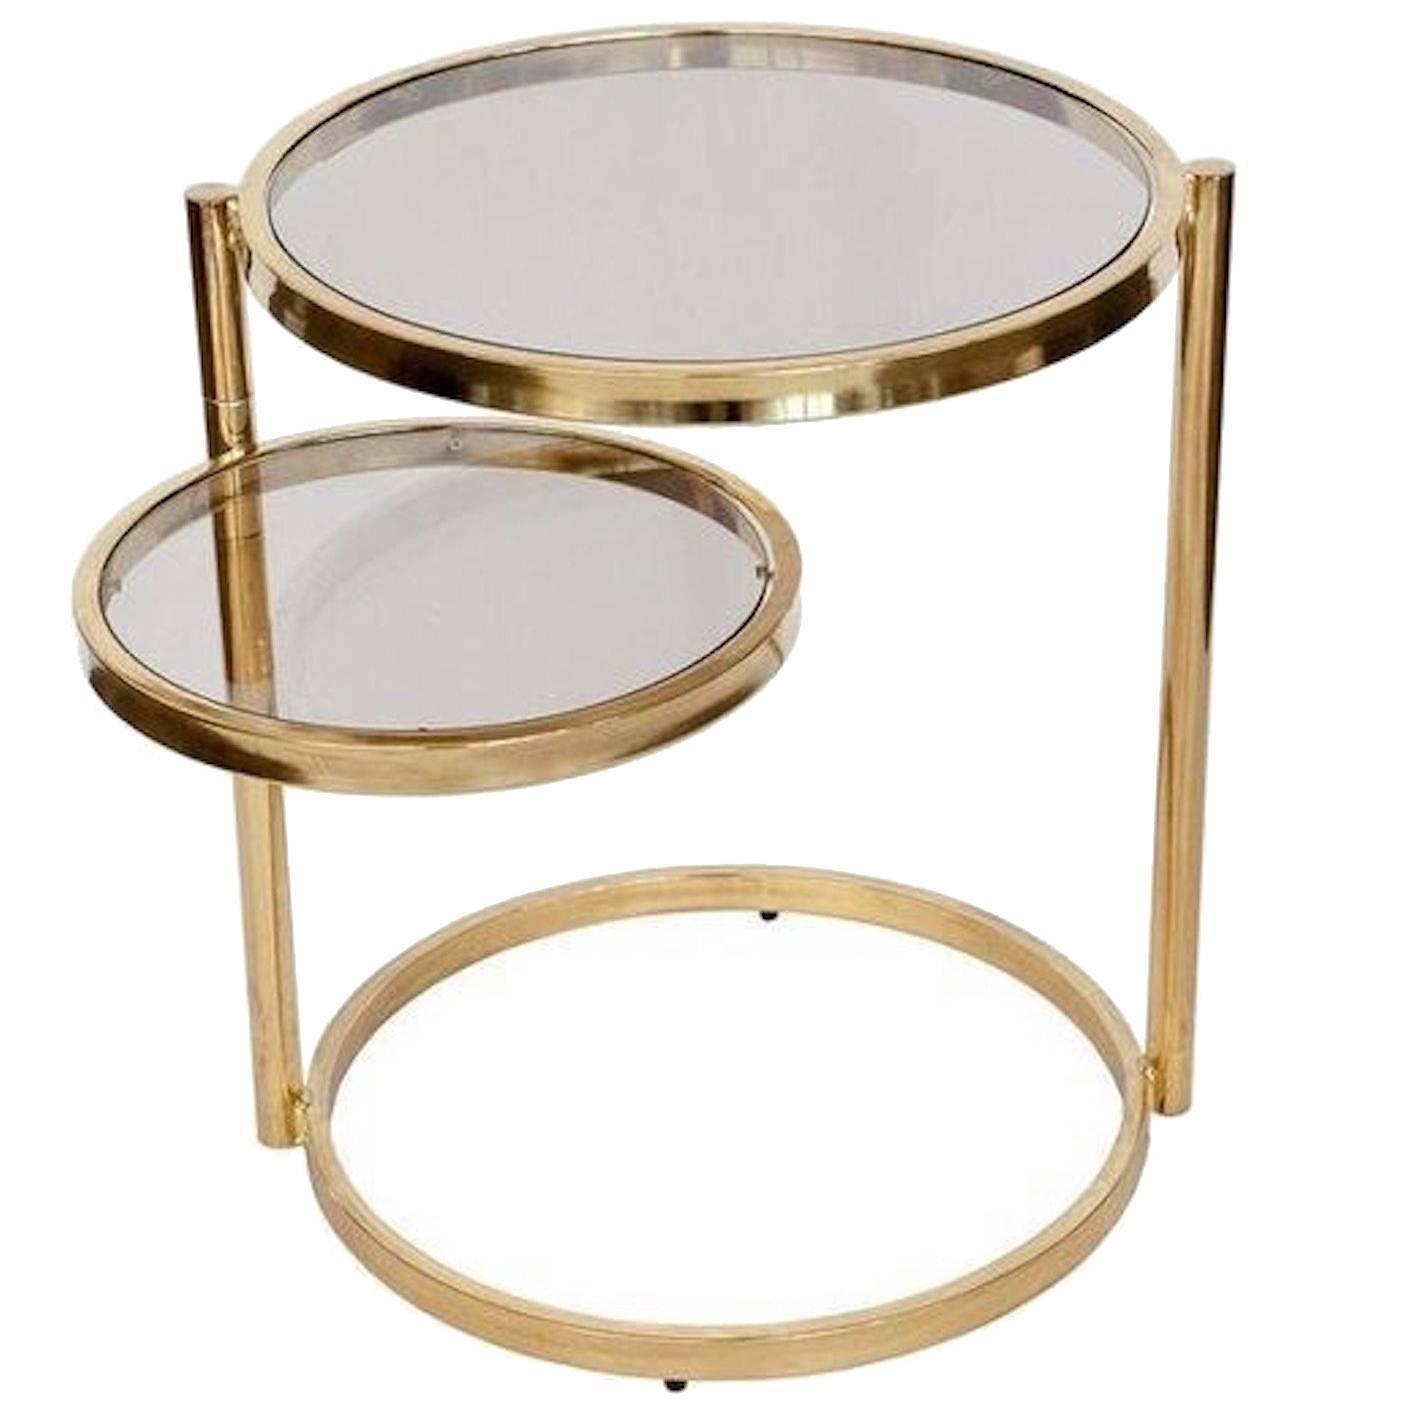 'DIA' Design Institute of America Brass Swivel Ring Table